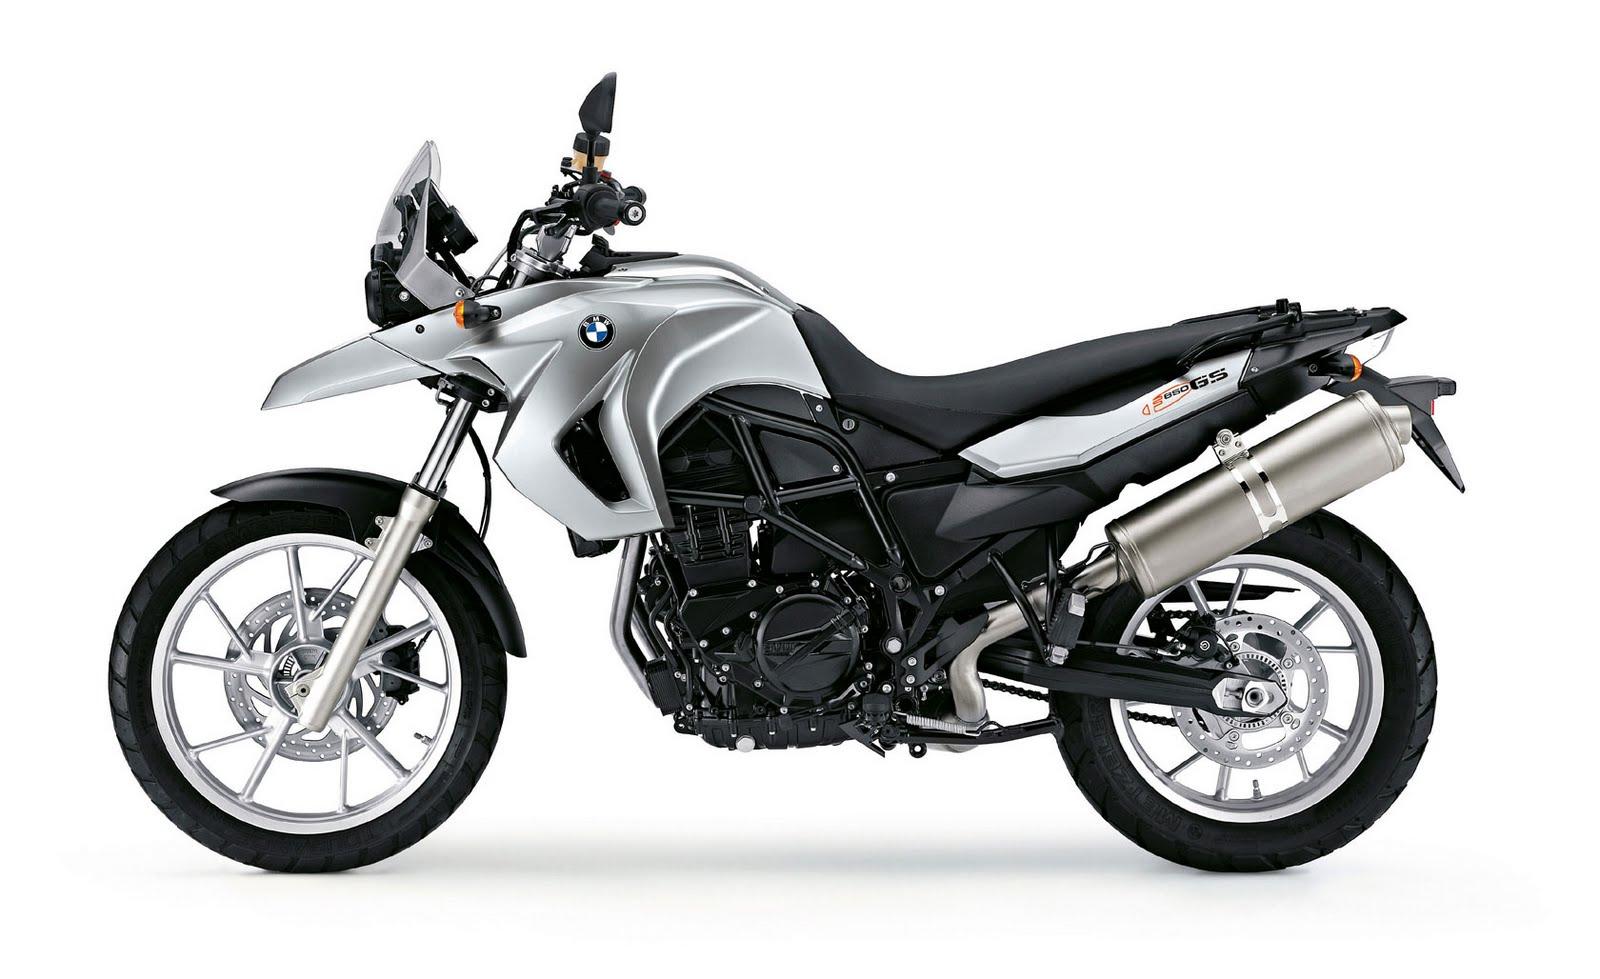 http://2.bp.blogspot.com/_UOvkf4TAoqo/TEZoUN4dJPI/AAAAAAAAANg/V_Ta2n1BCEI/s1600/2010+BMW+F650GS-left+silver+angle.jpg